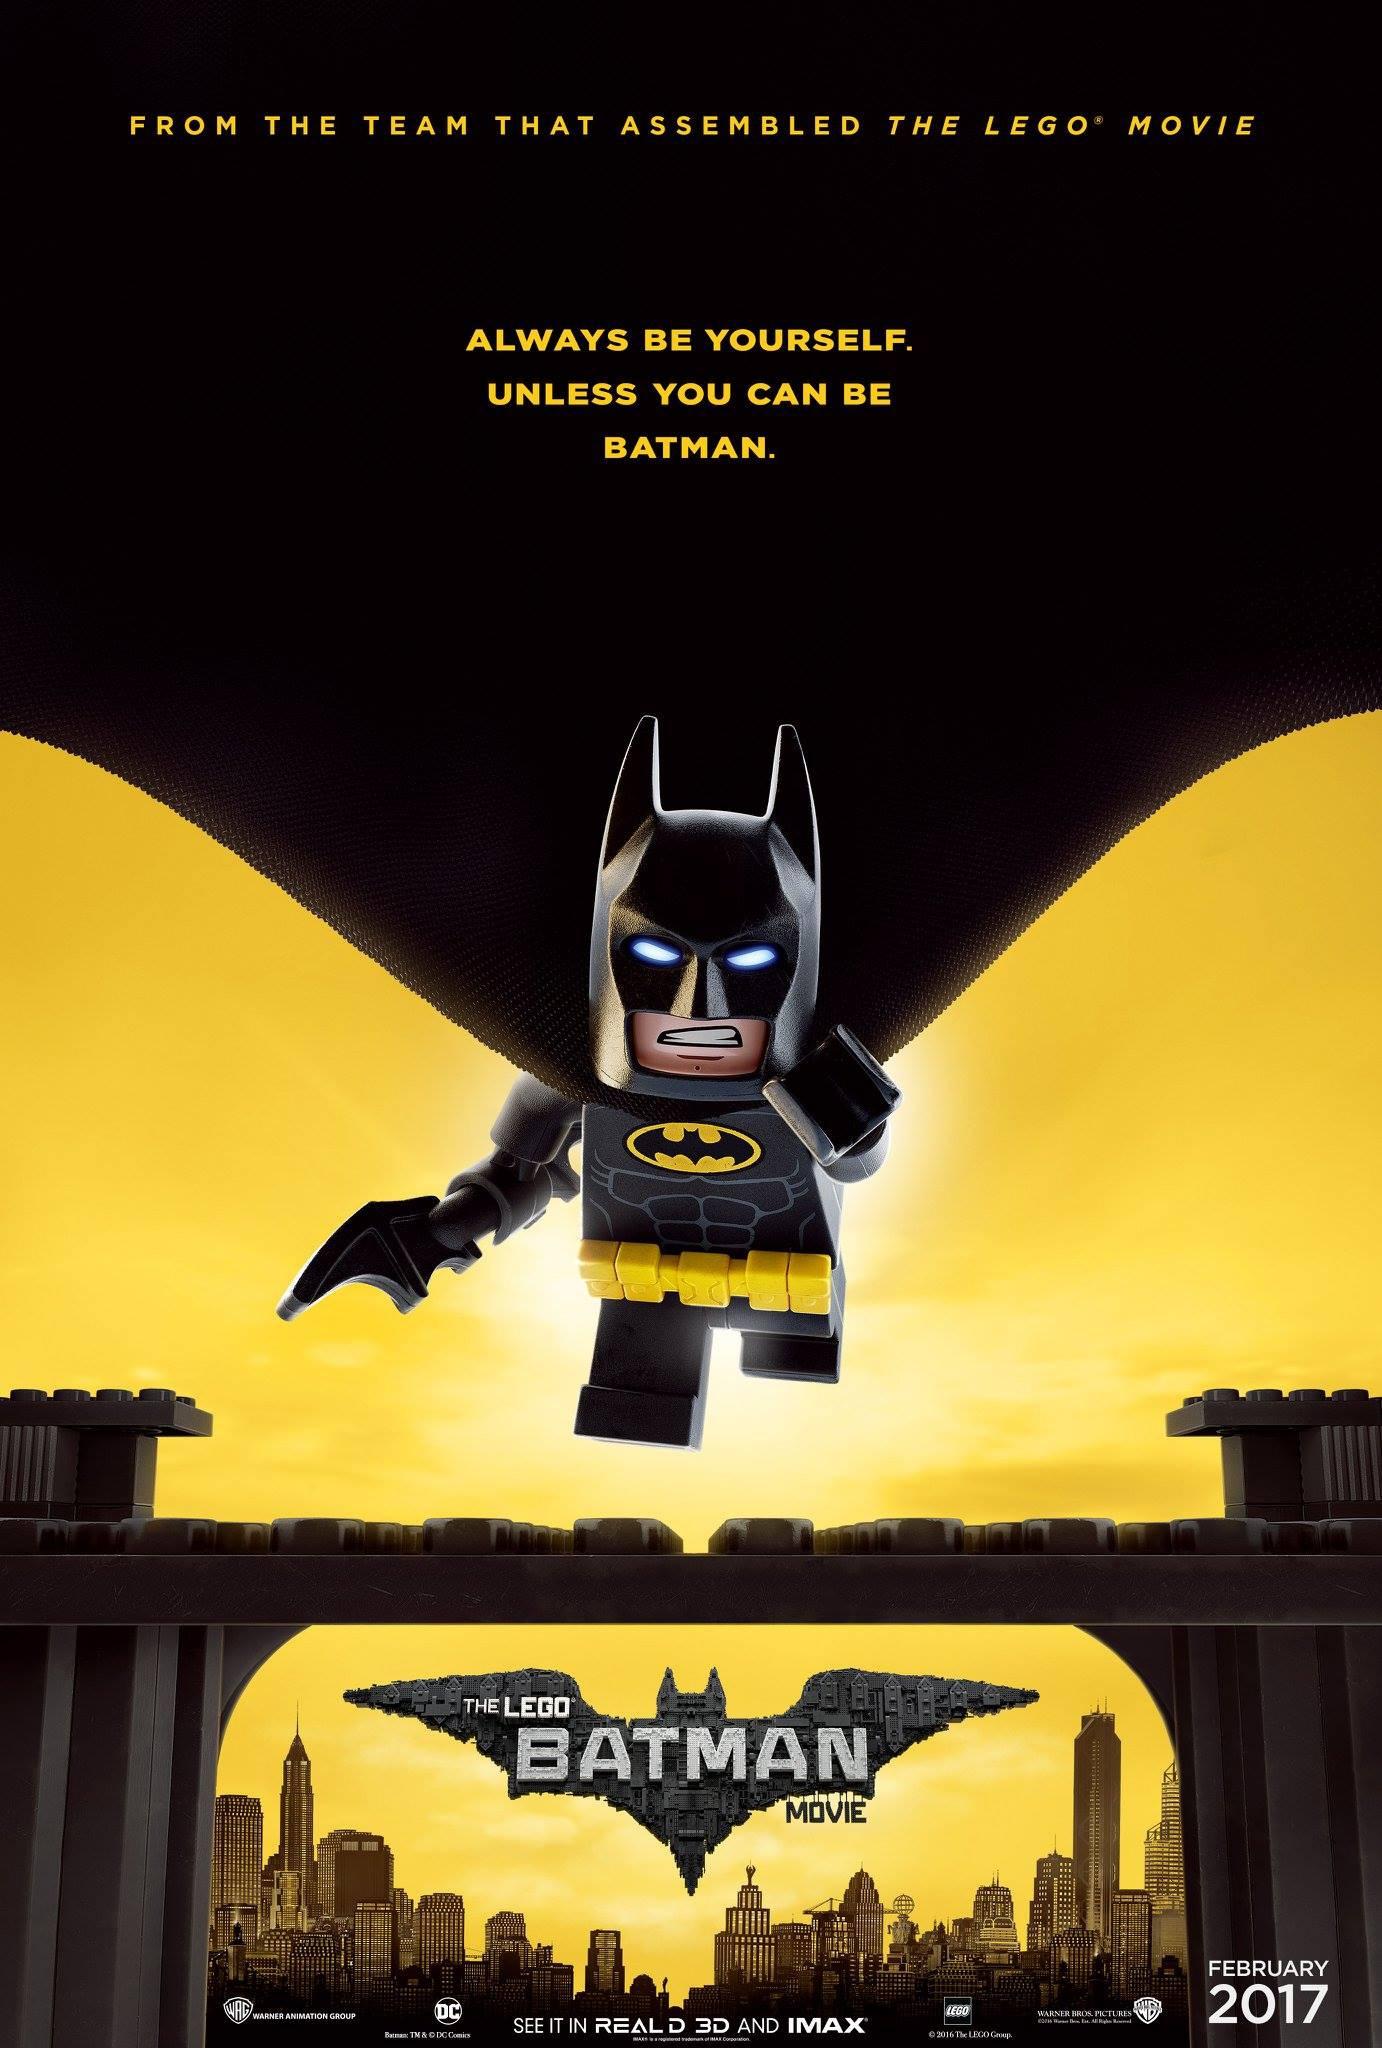 lego_batman_movie_p3.png